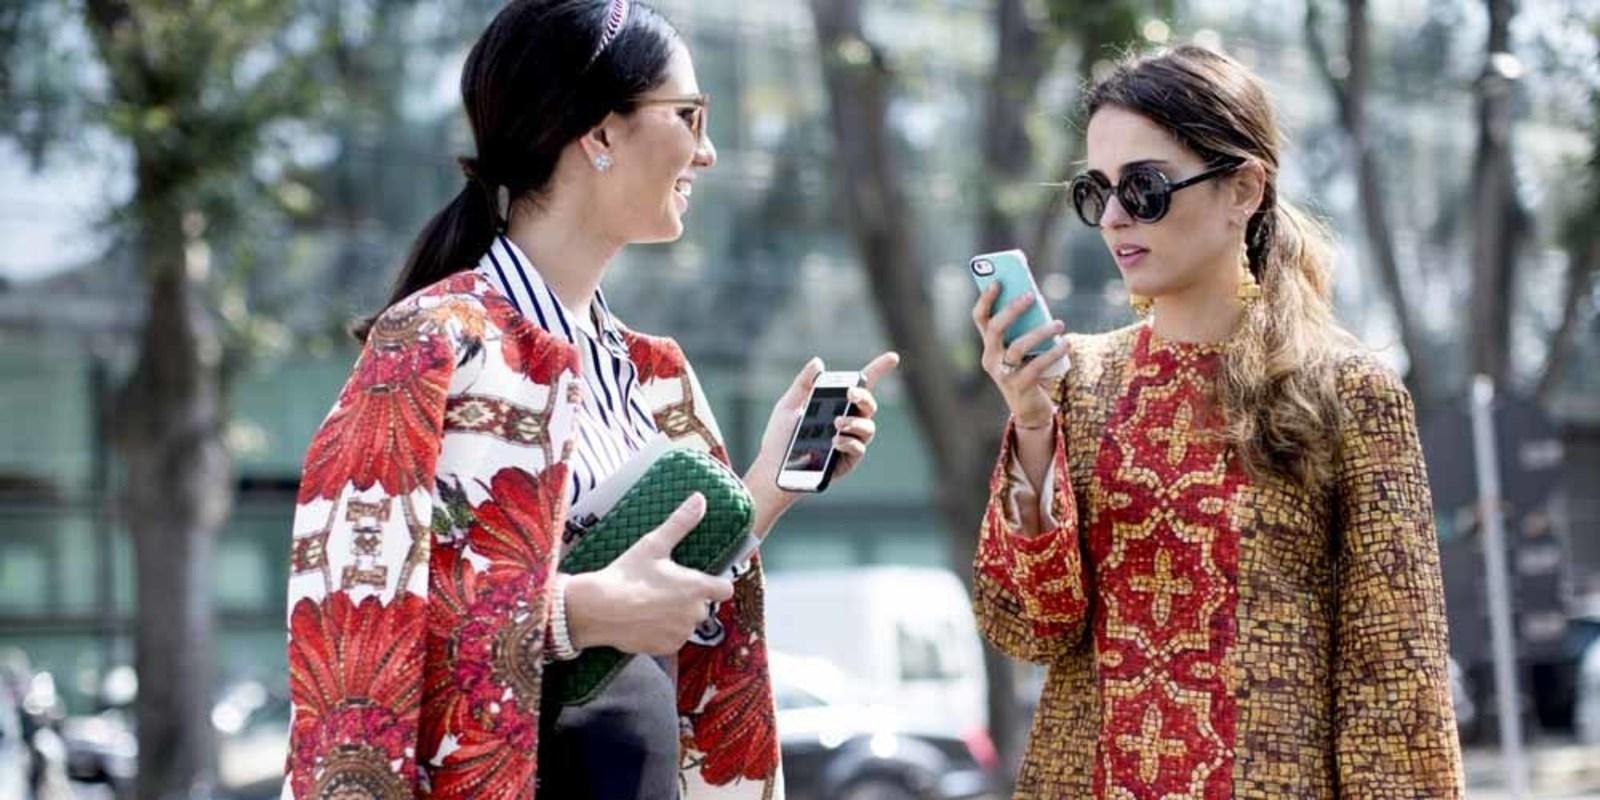 Flirten op social media Social Media gebruik; Mannen versus Vrouwen, Fleur Flirt